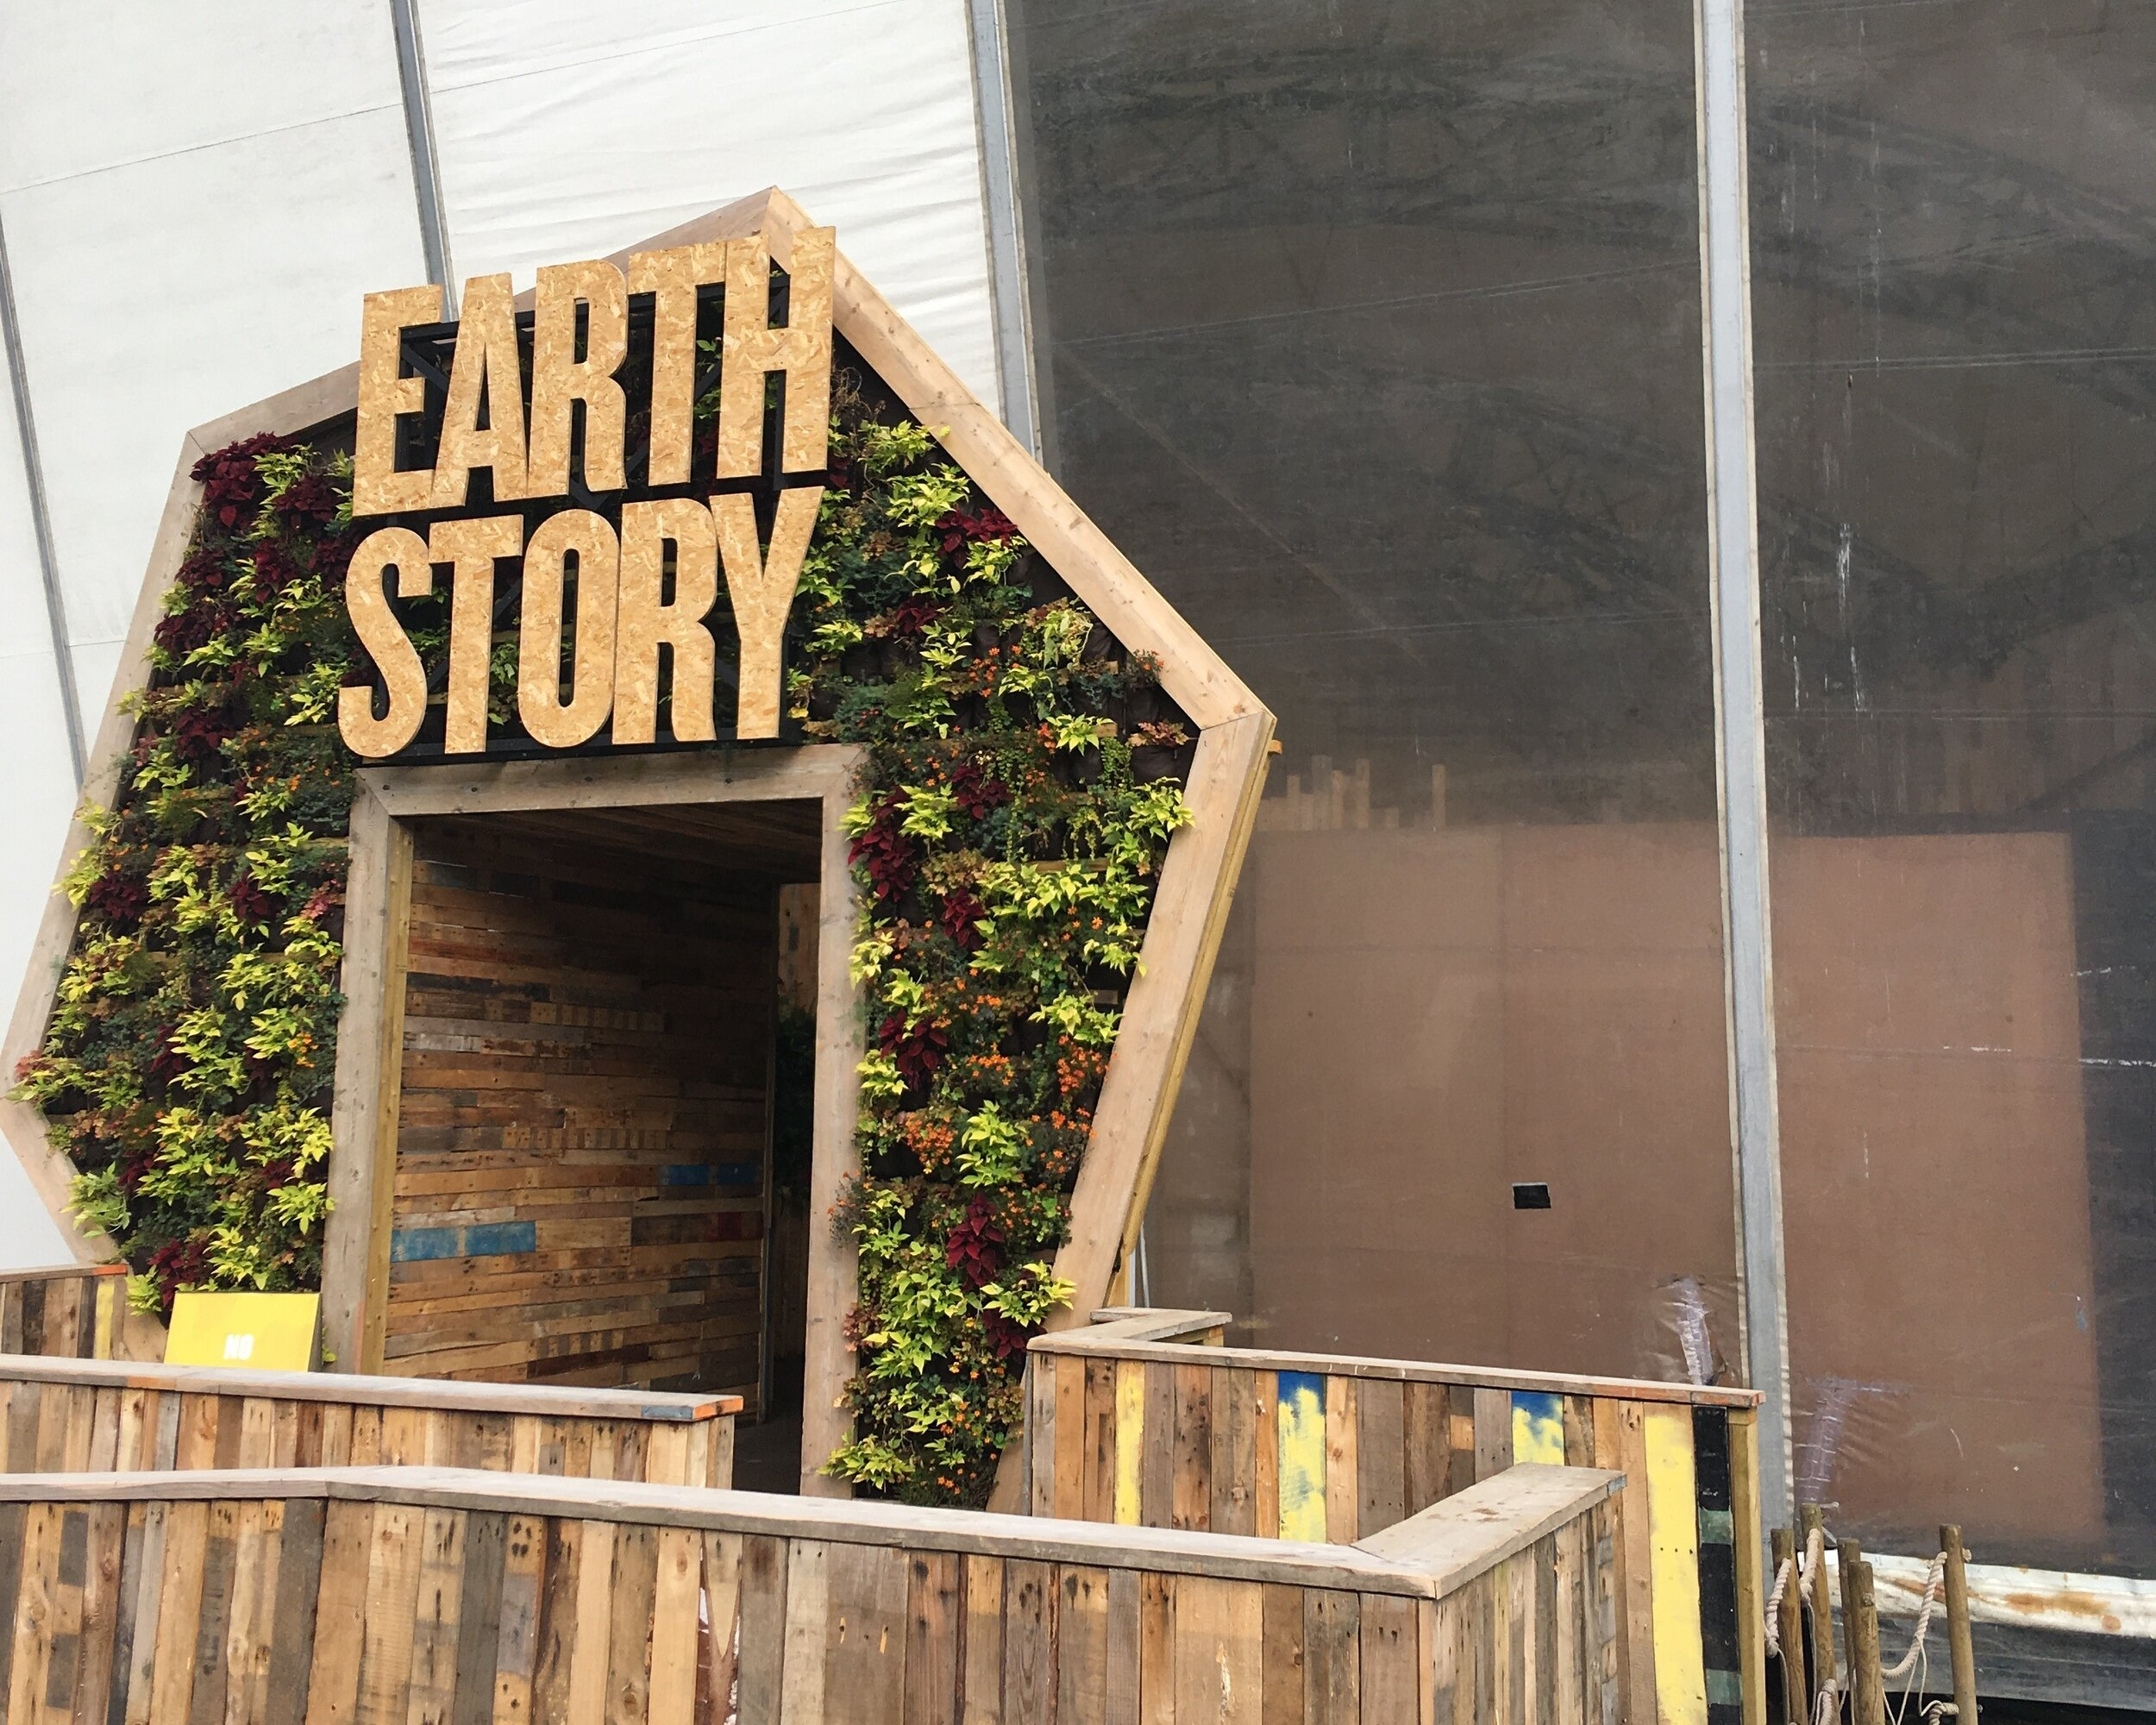 Earth Story.jpg